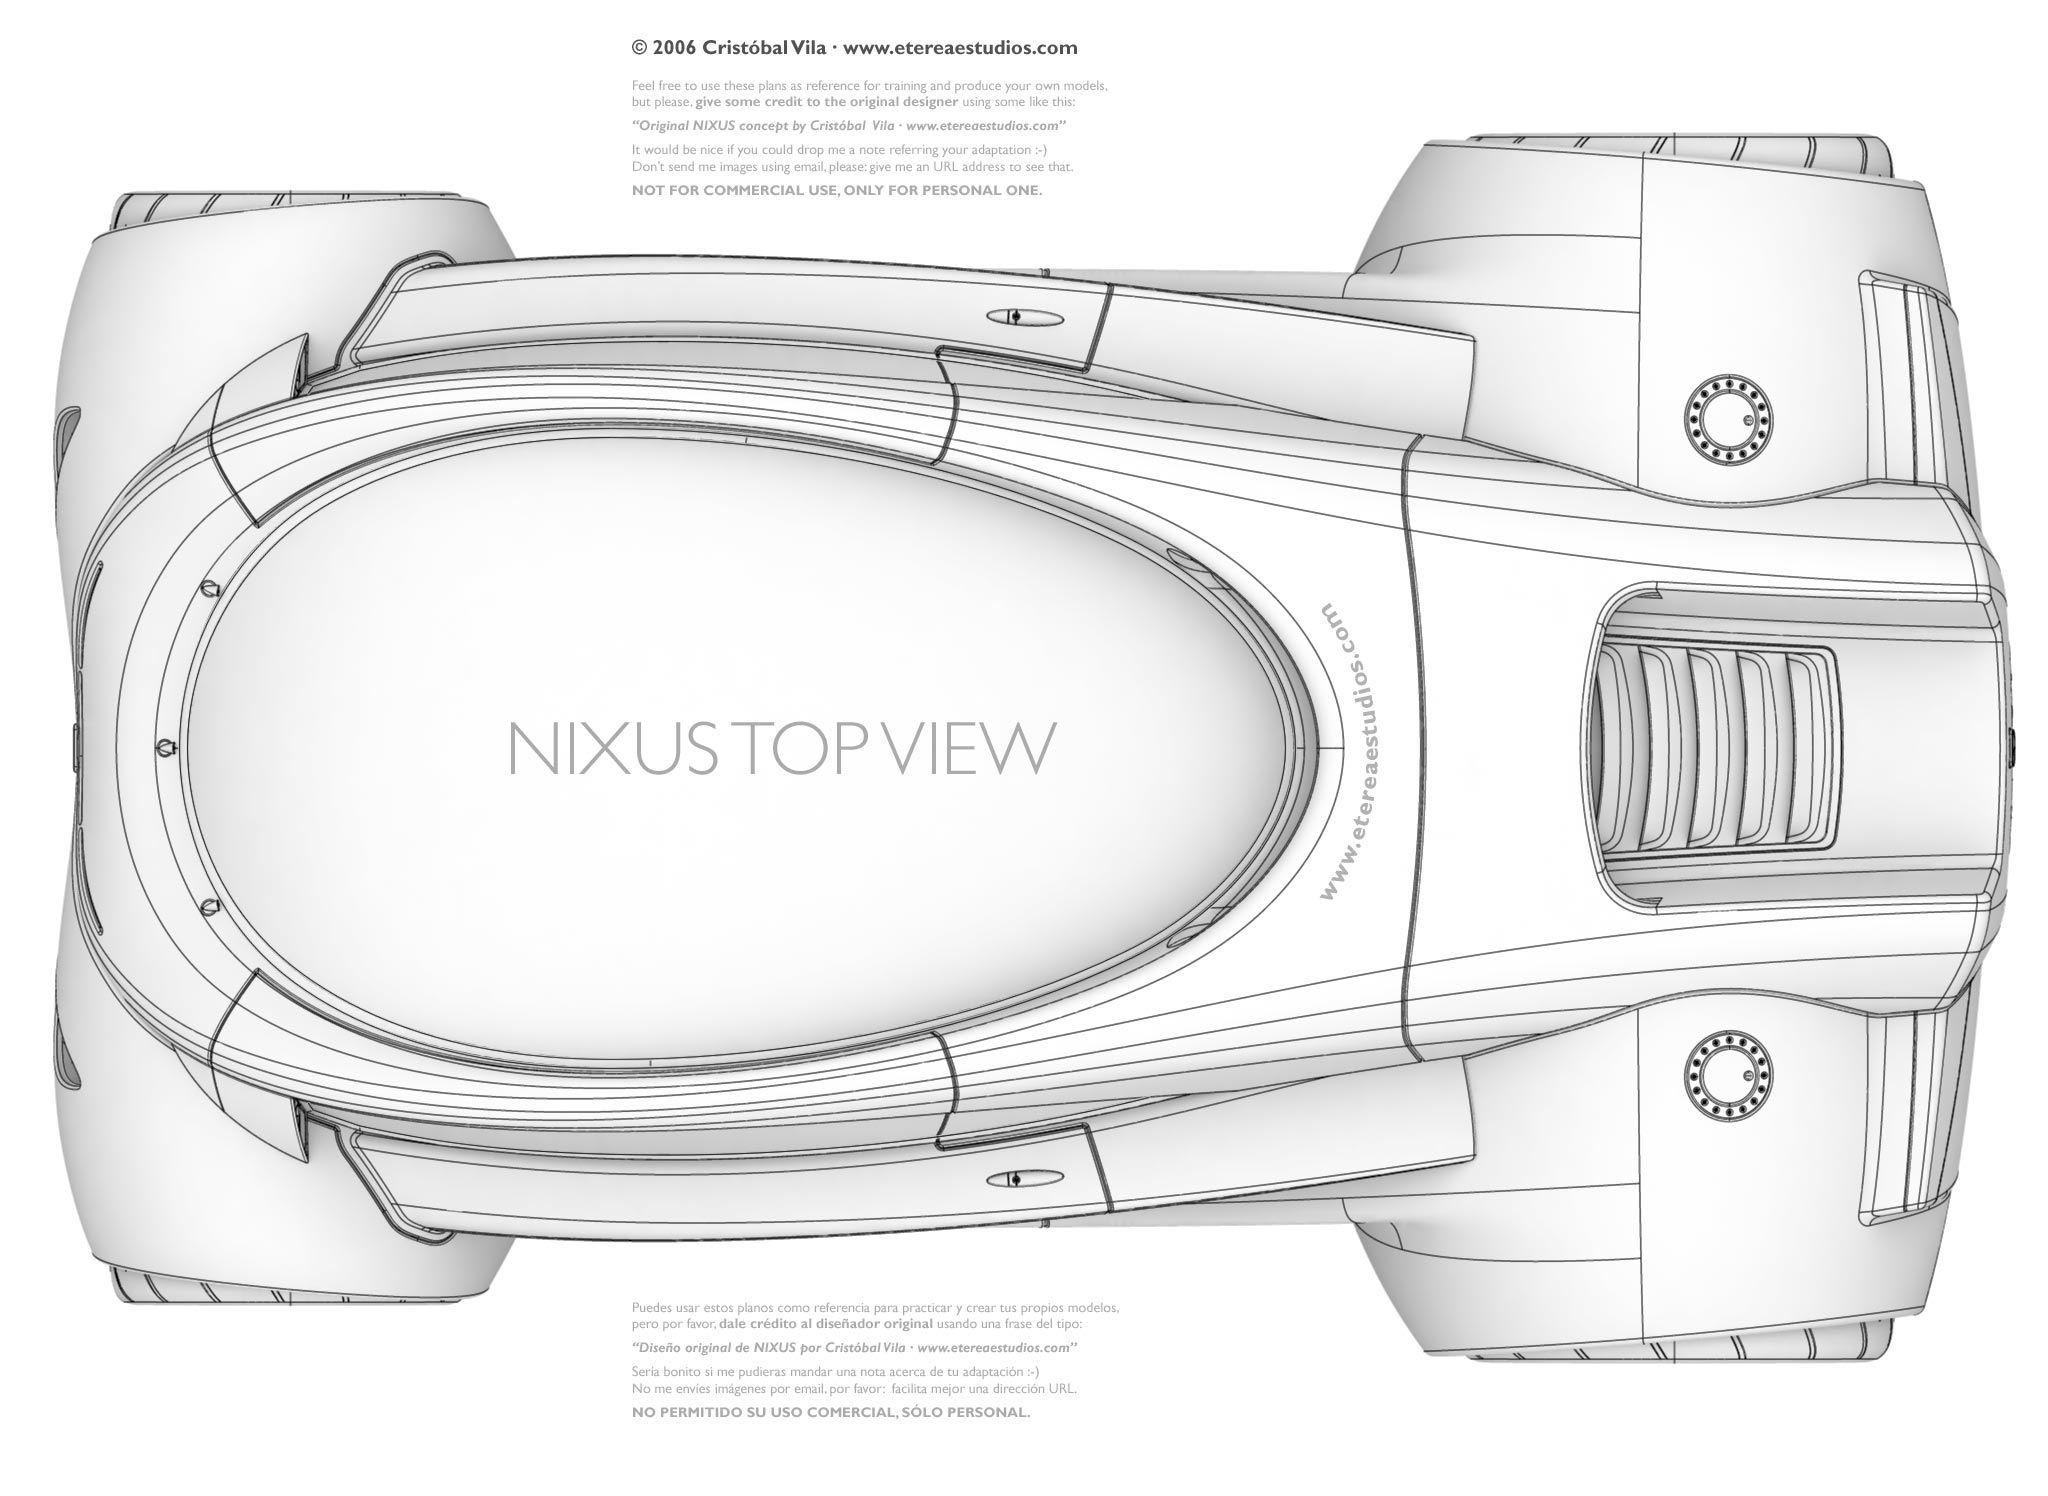 Nixus top view | Blueprint | Pinterest | Online portfolio